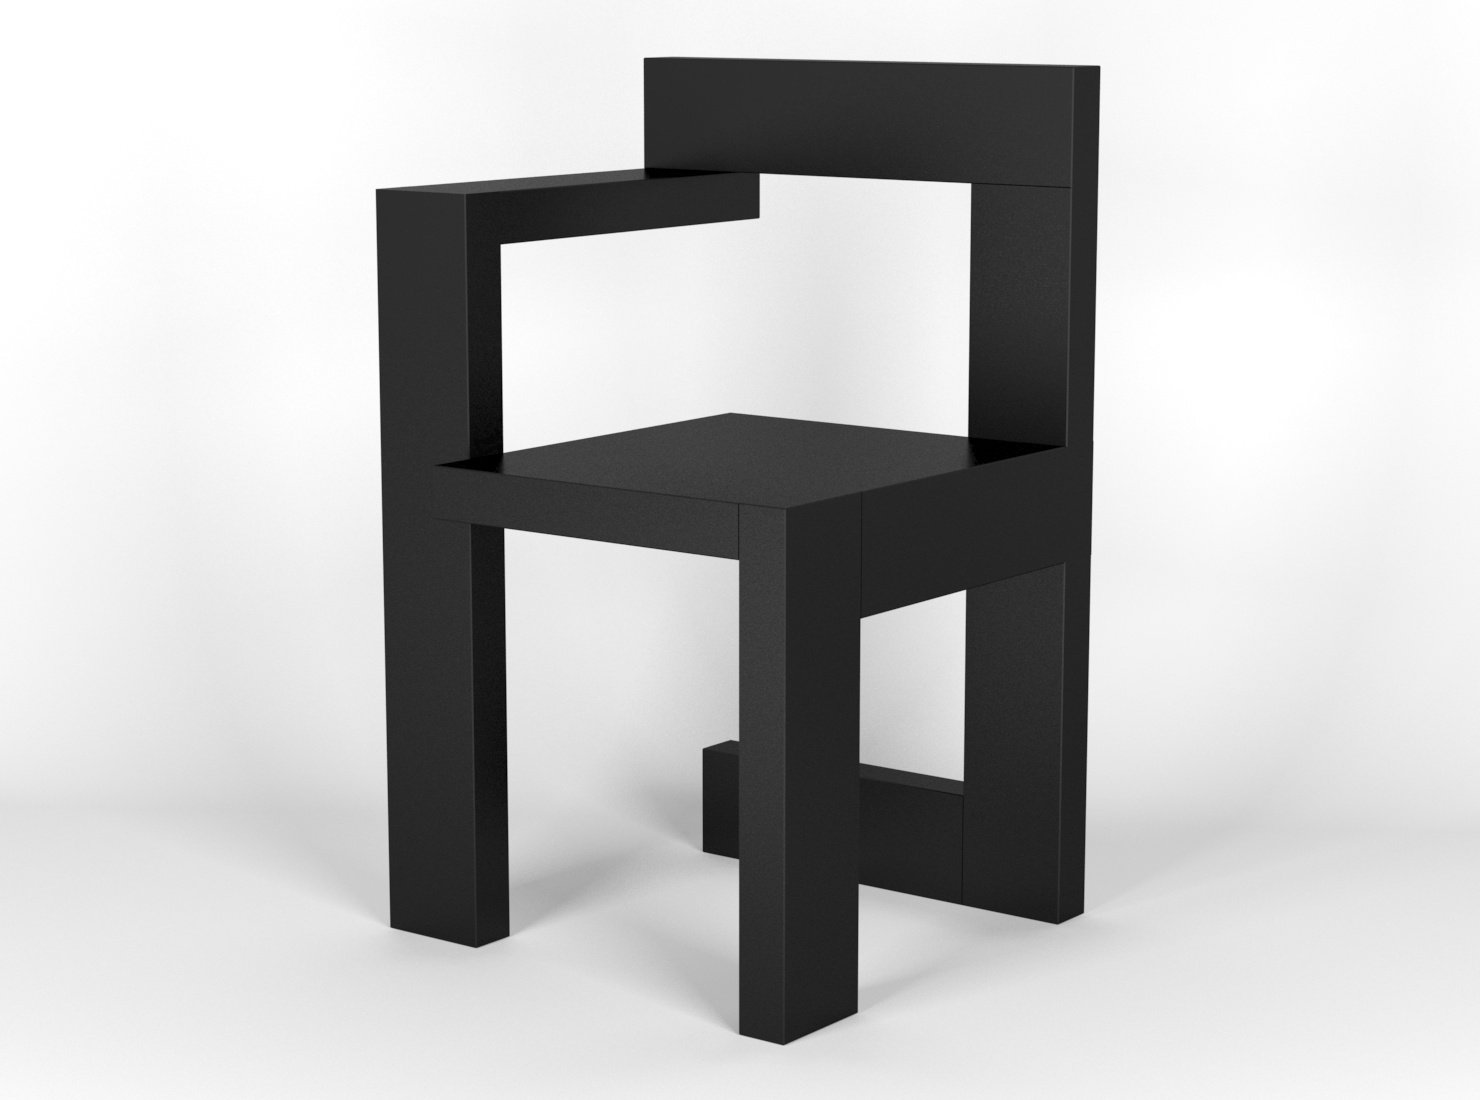 Stoel Gerrit Rietveld : Steltman chair designed by gerrit rietveld 3d model in stoel 3dexport